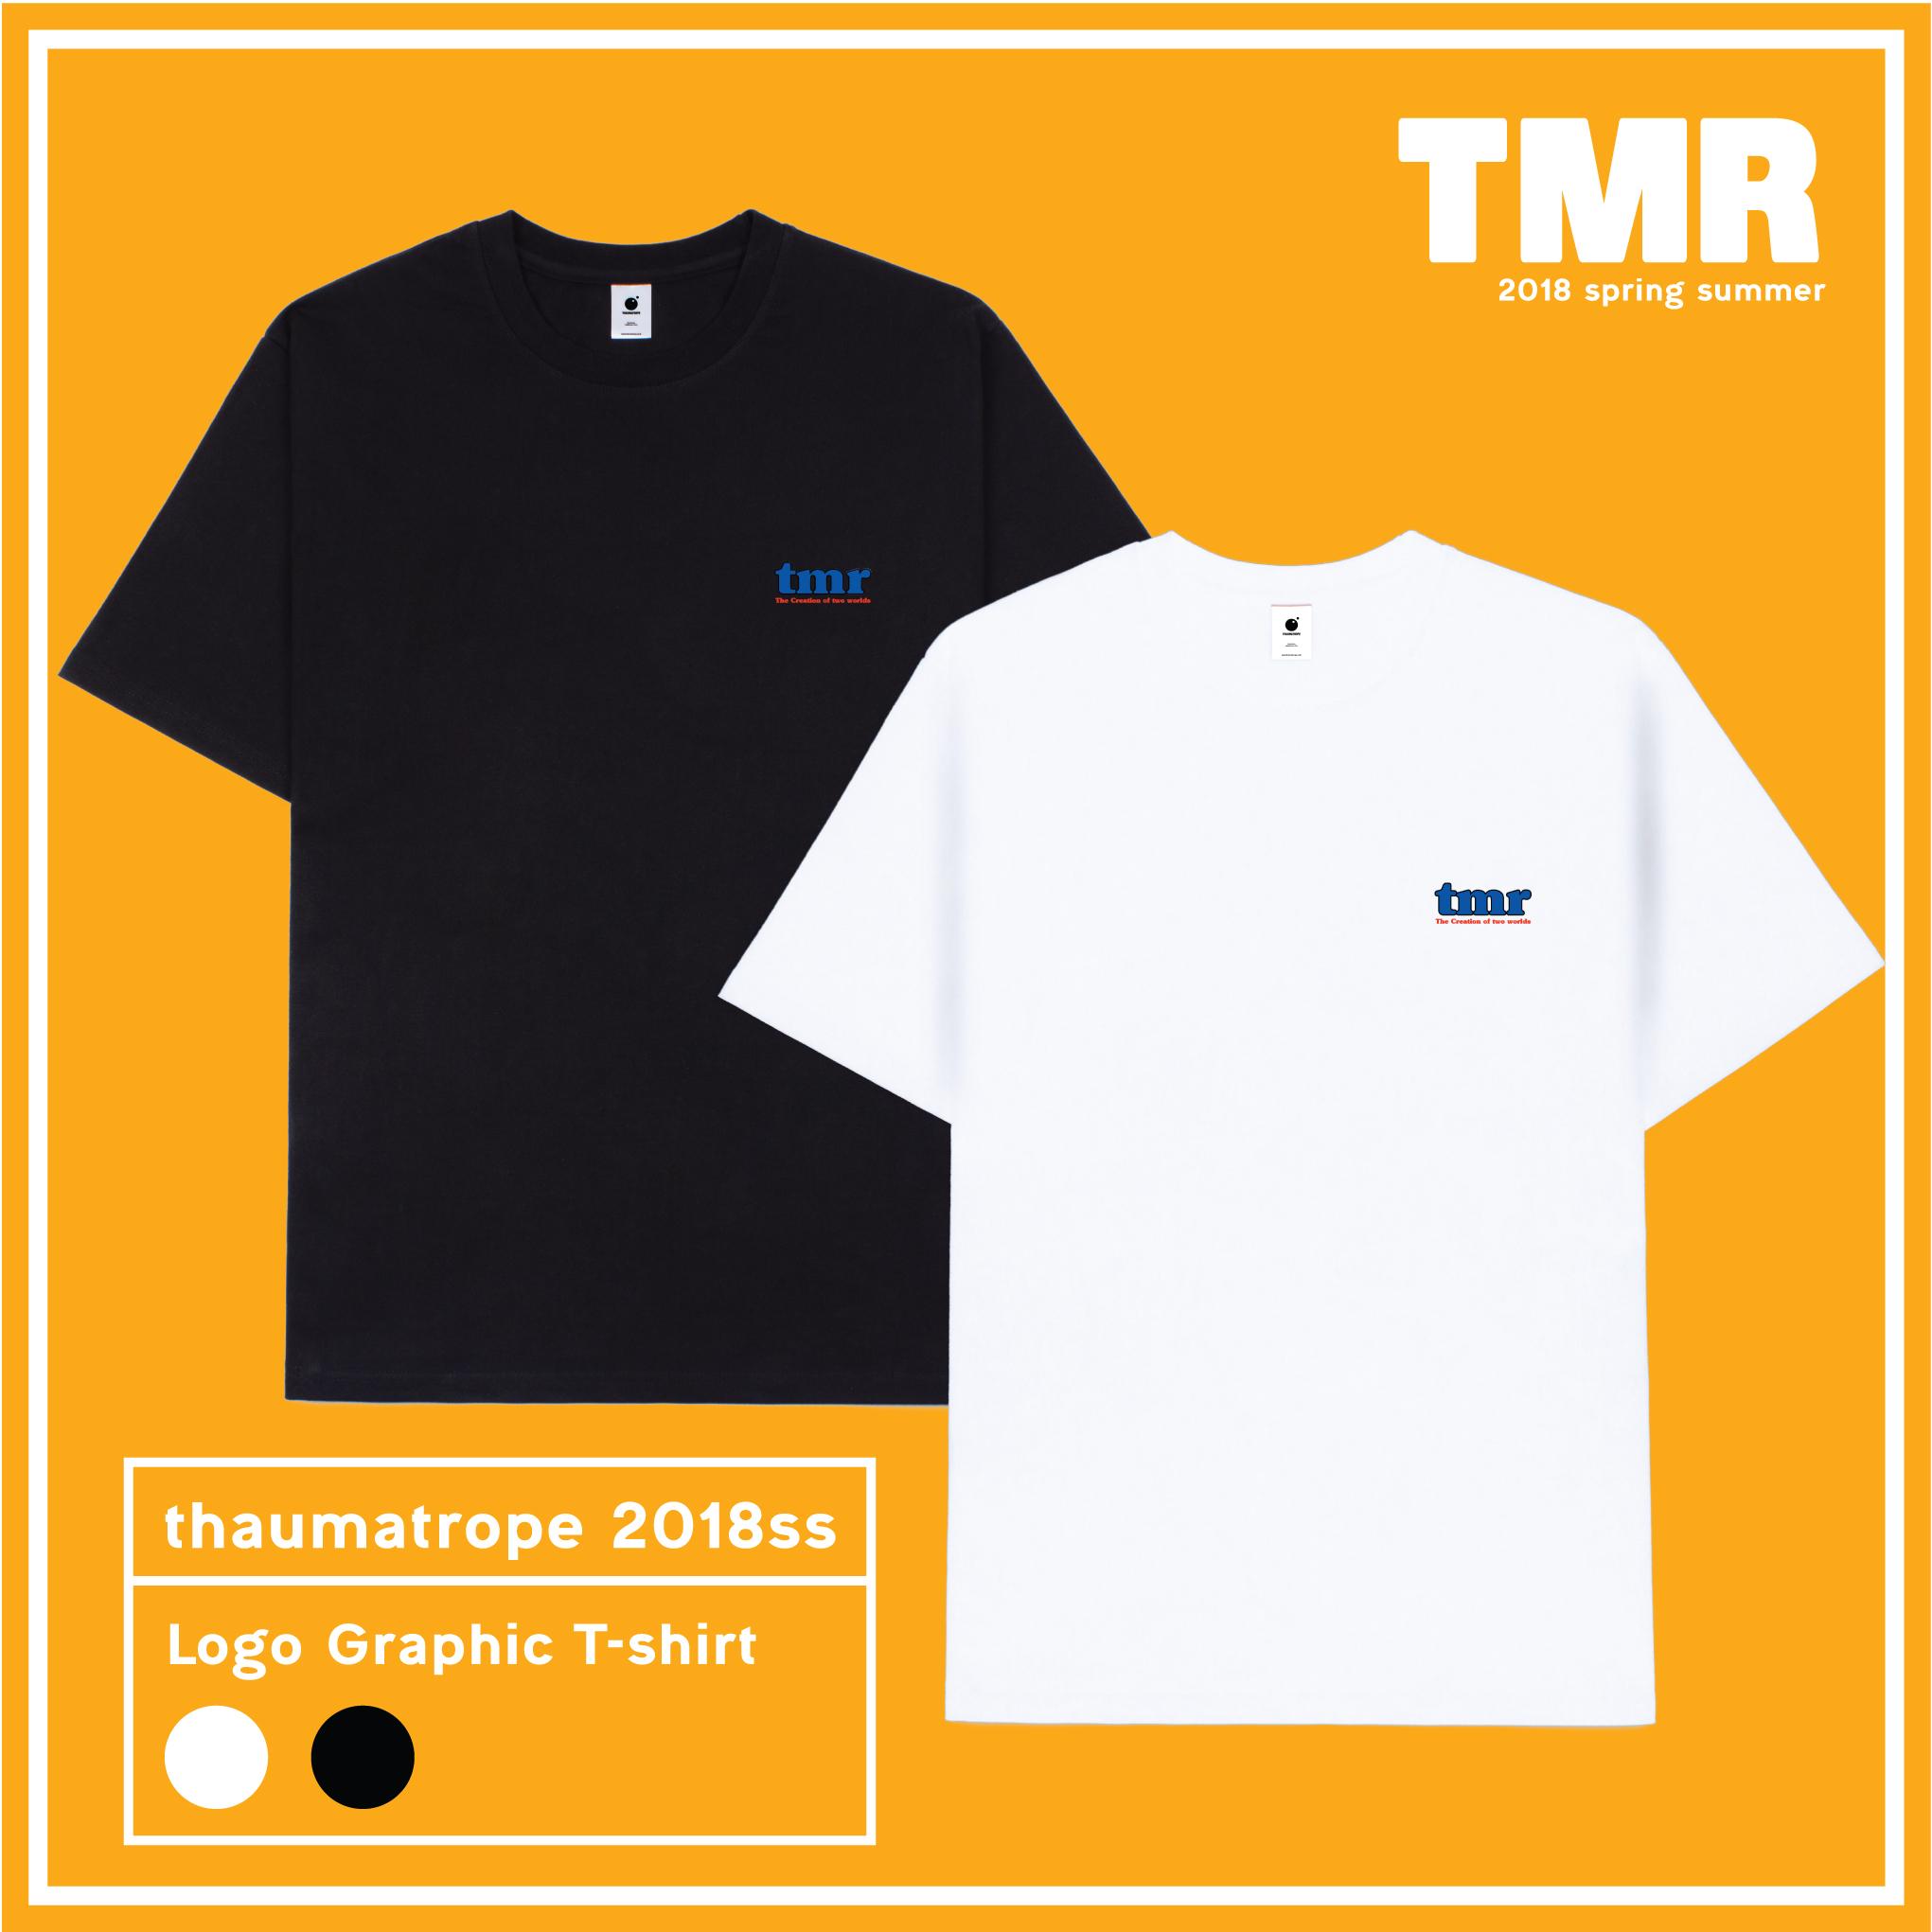 TMR LOGO T-SHIRTS